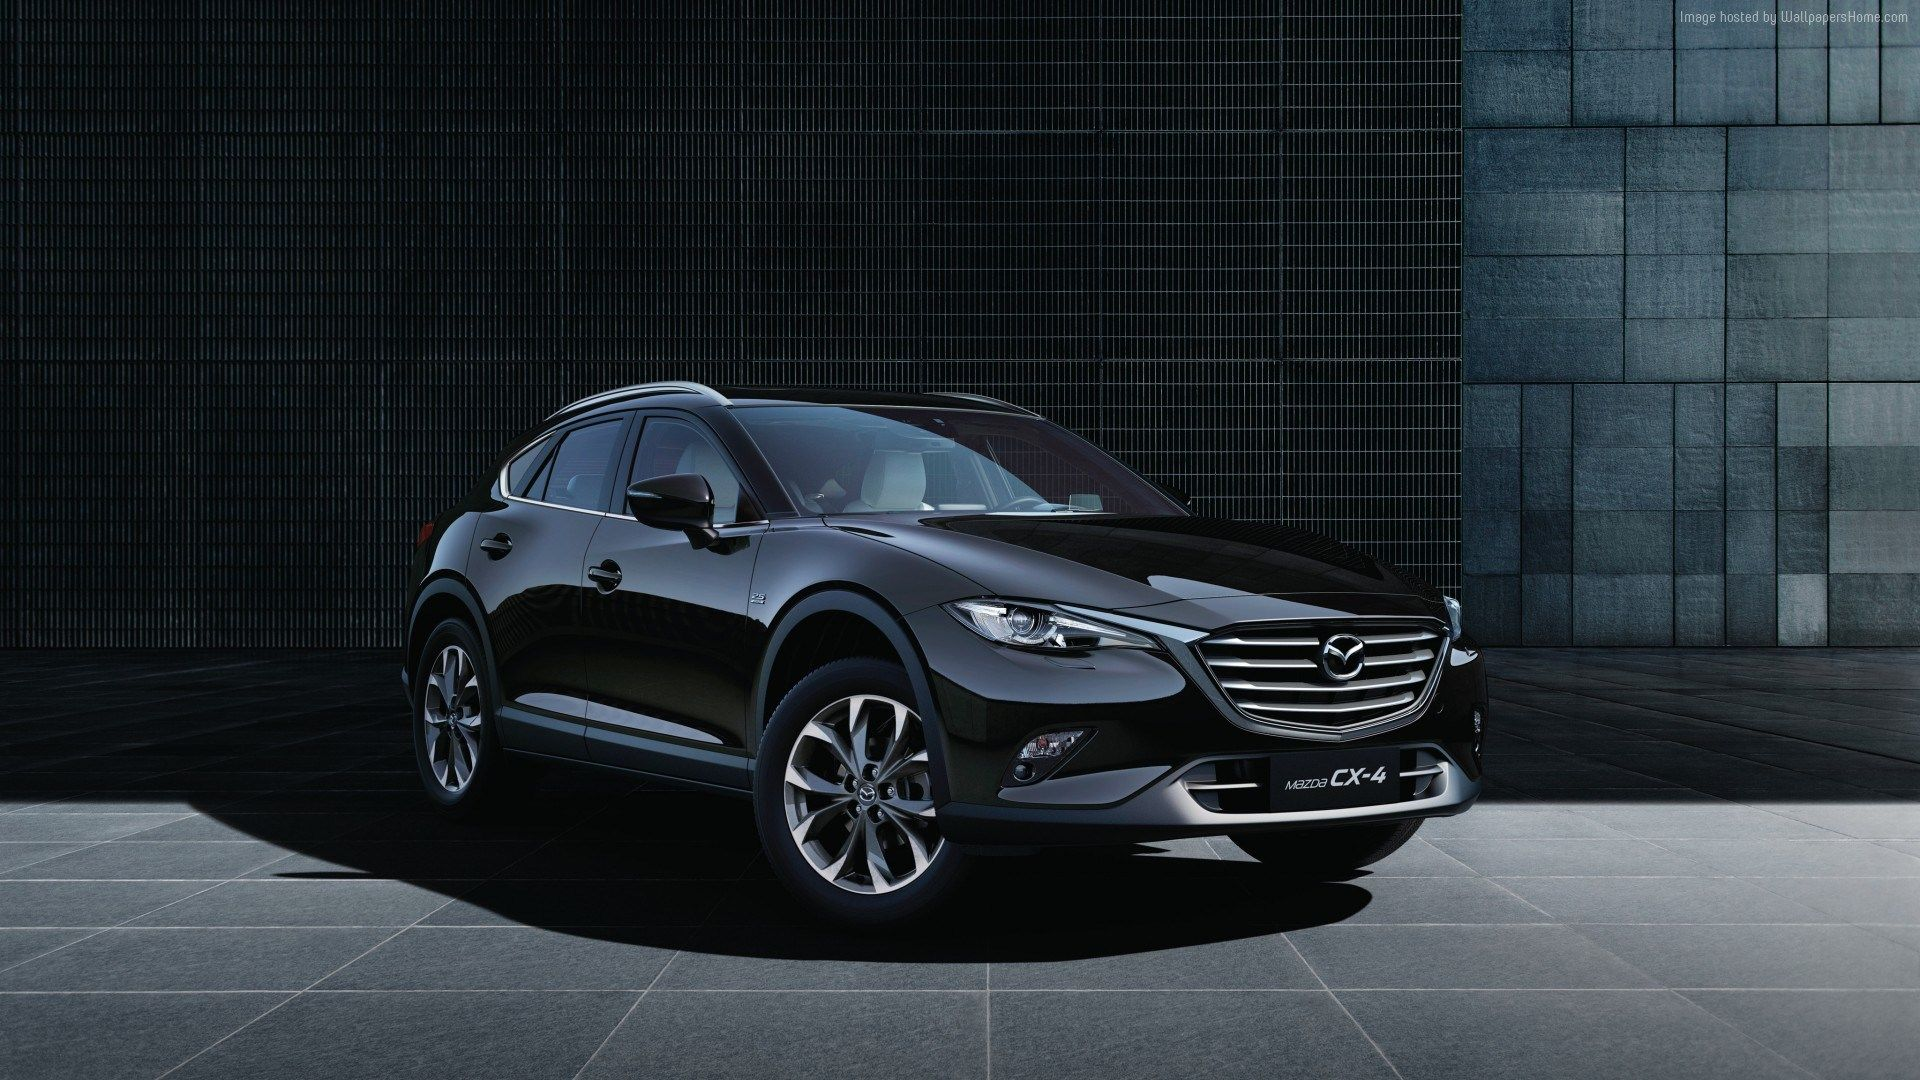 Mazda Cx 4 Wallpaper · HandmadeDiyYoutubeMazdaWallpapersExterior  DesignGlass ReplacementAmsterdamBuild Your Own